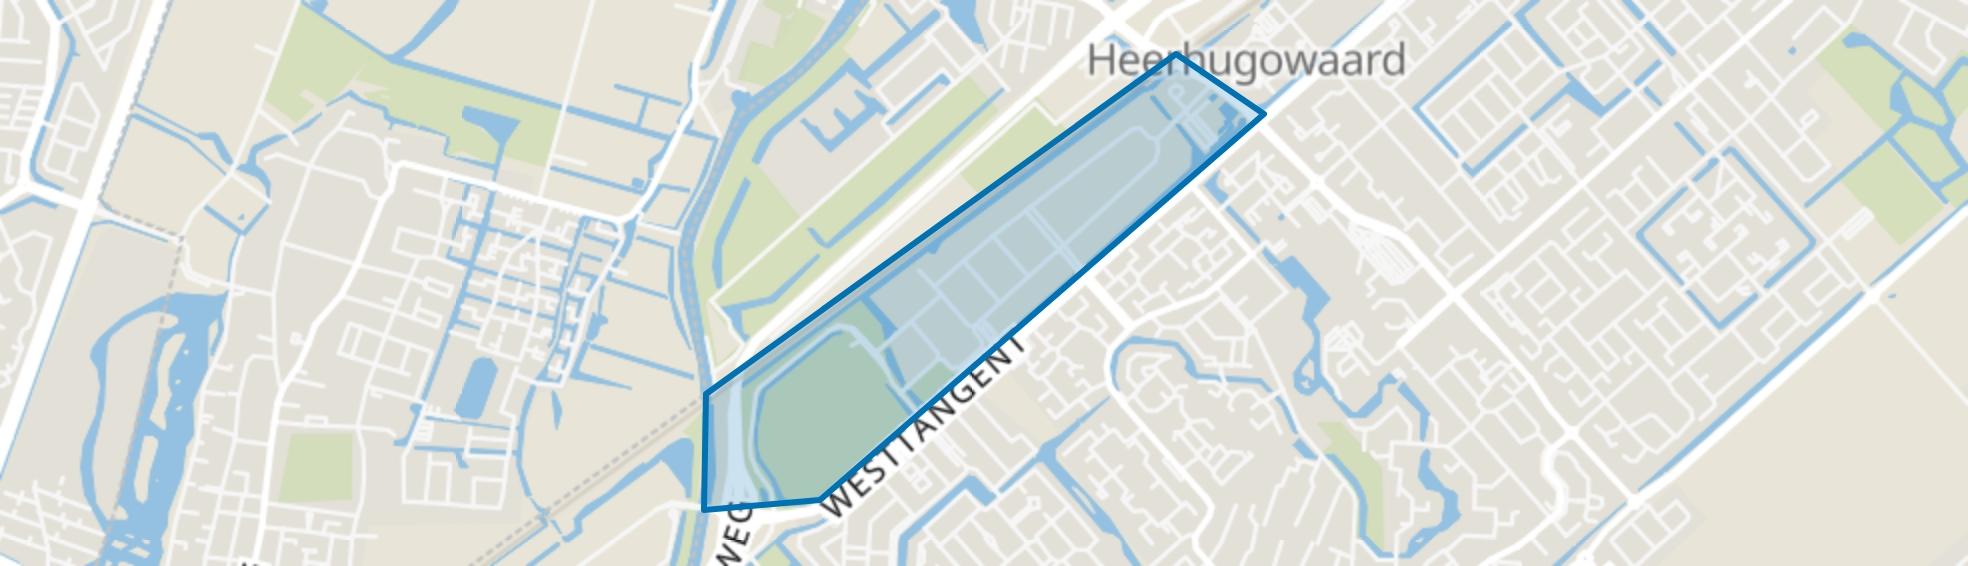 Beveland, Heerhugowaard map